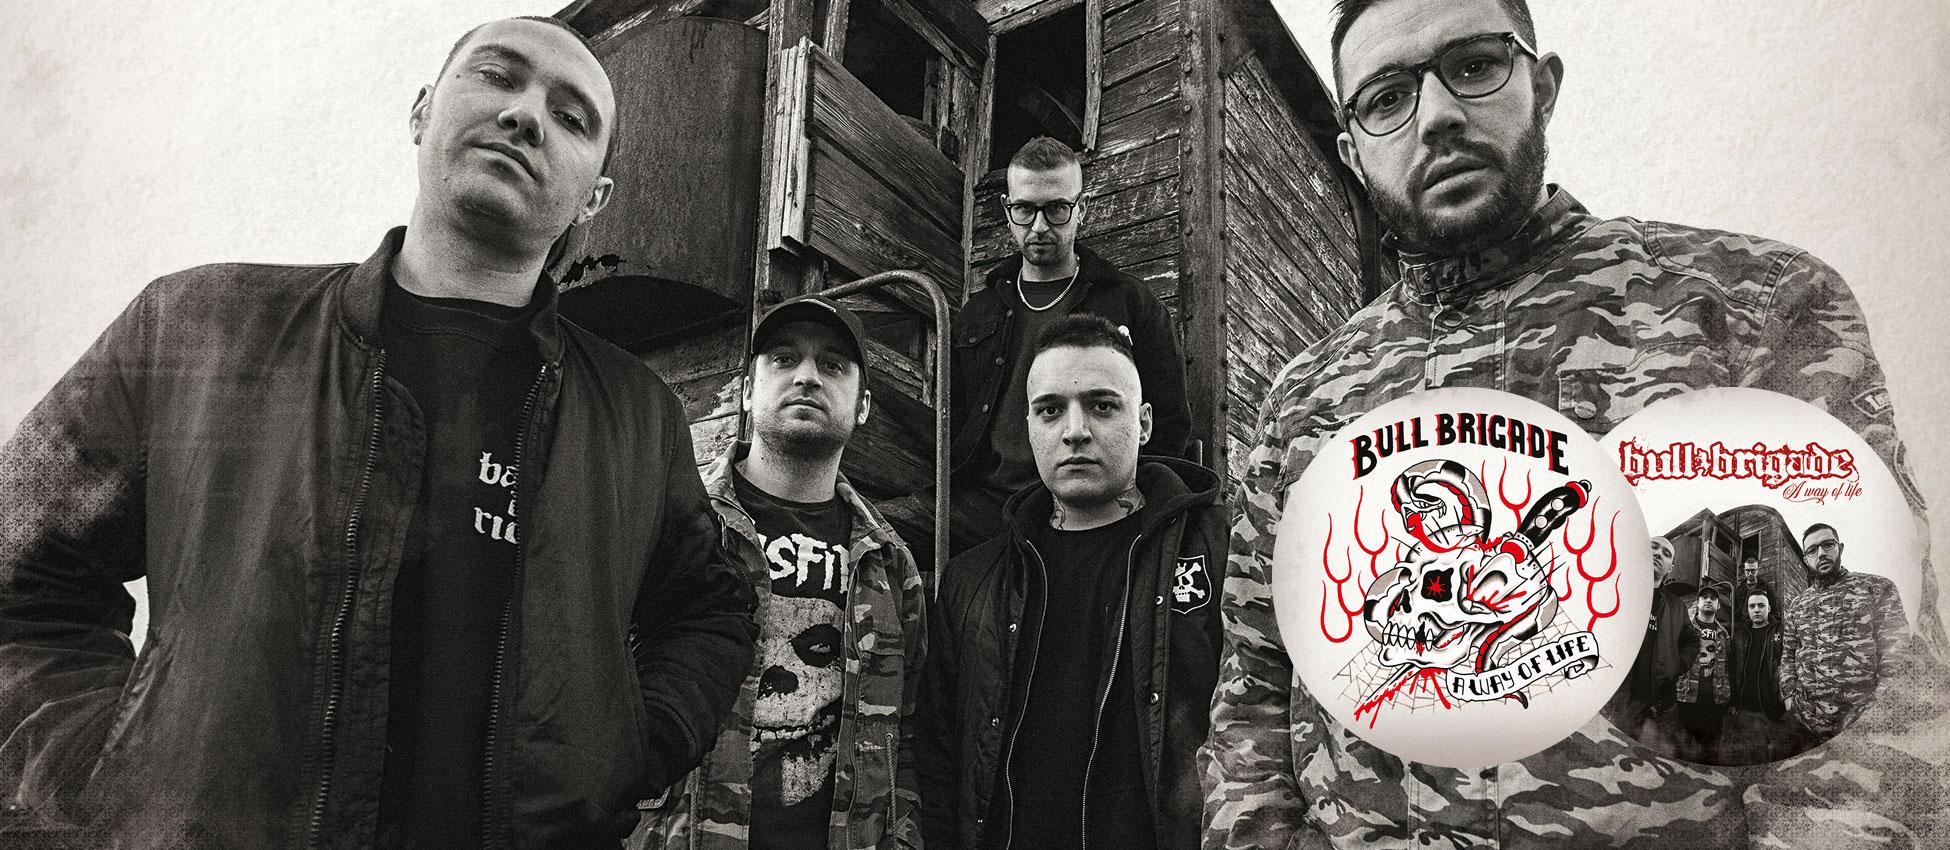 [FFM065] Bull Brigade – A Way Of Life Pic. 7″